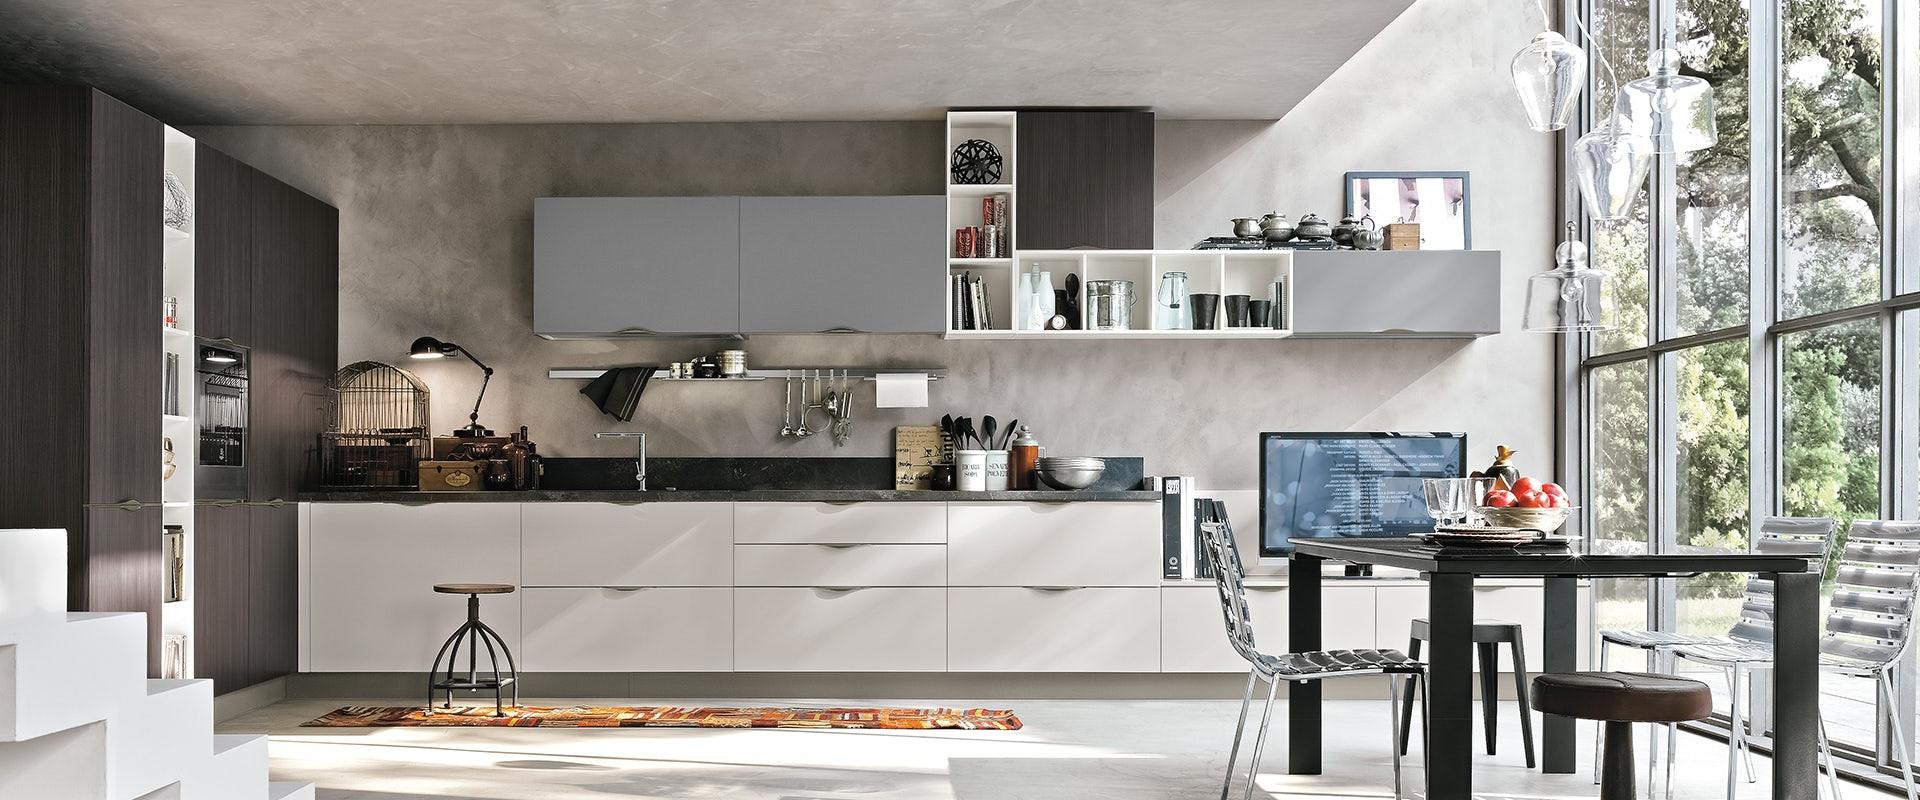 stosa-cucine-moderne-replay-305.jpg